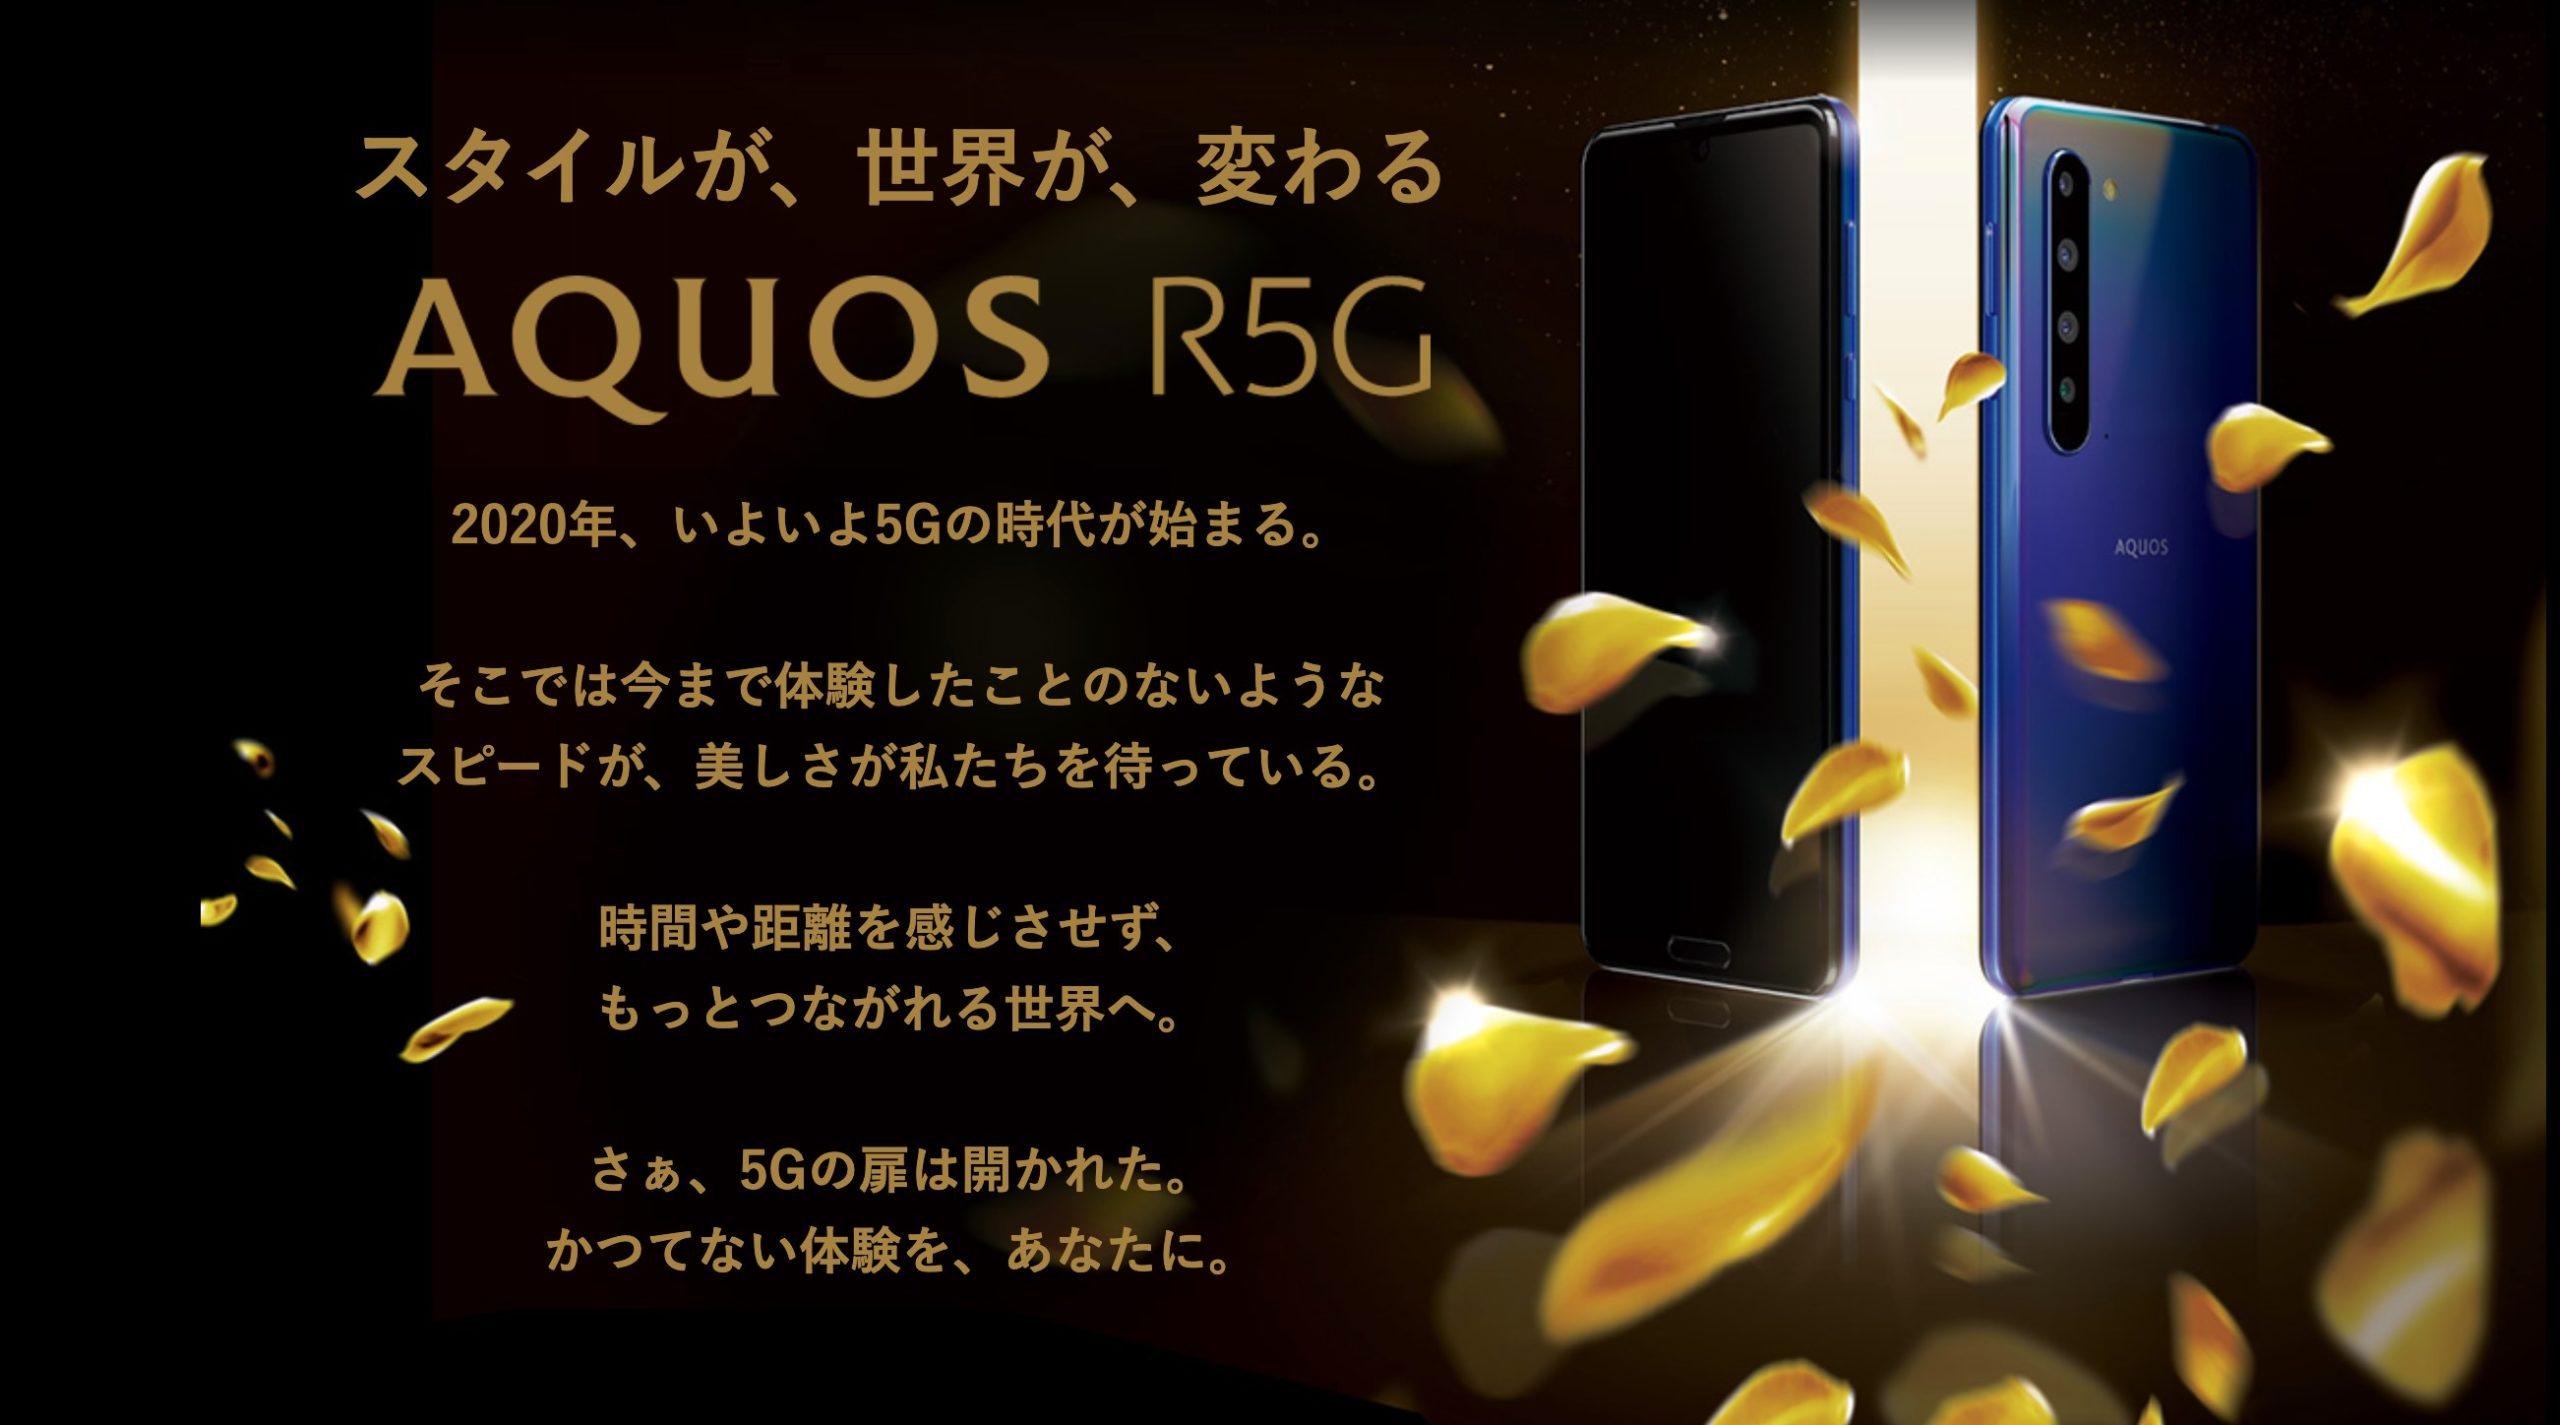 AQUOS R5G